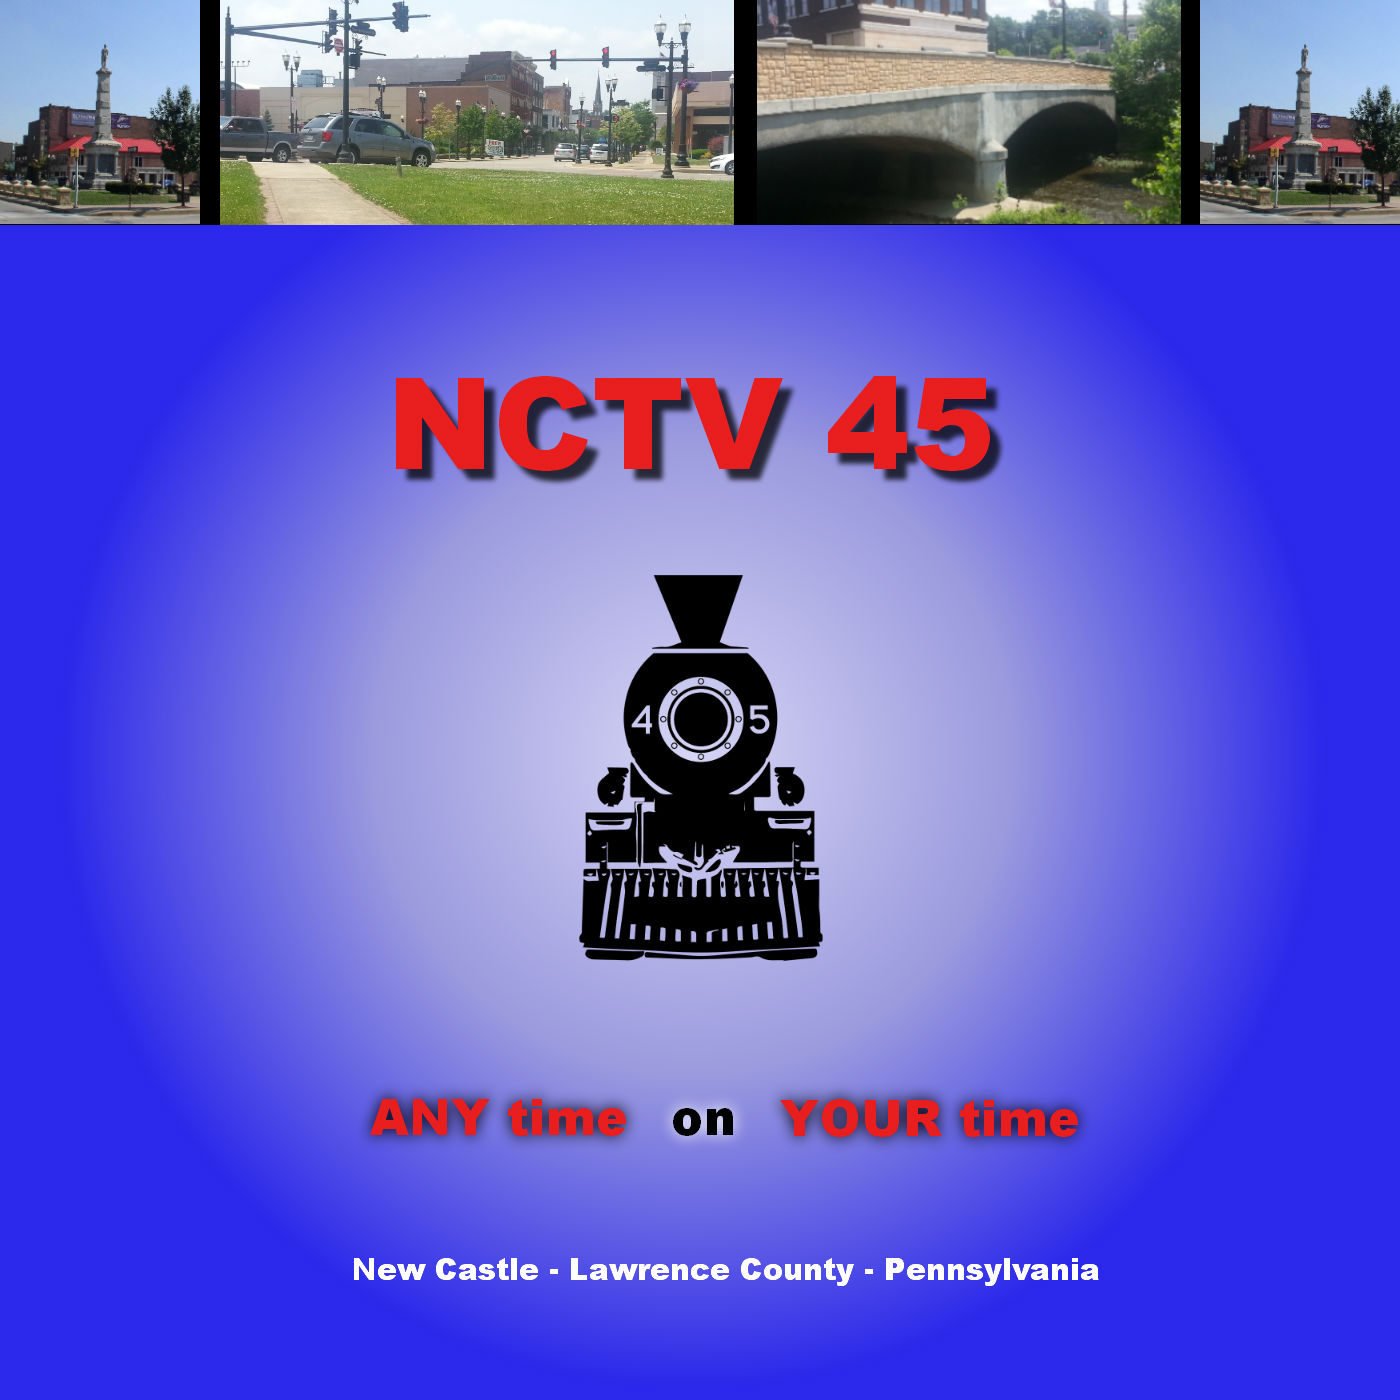 Artwork for NCTV45's NCLC Living: HOLY SPIRIT FESTIVAL; AND COMMUNITY DAYS AUGUST 3 2019